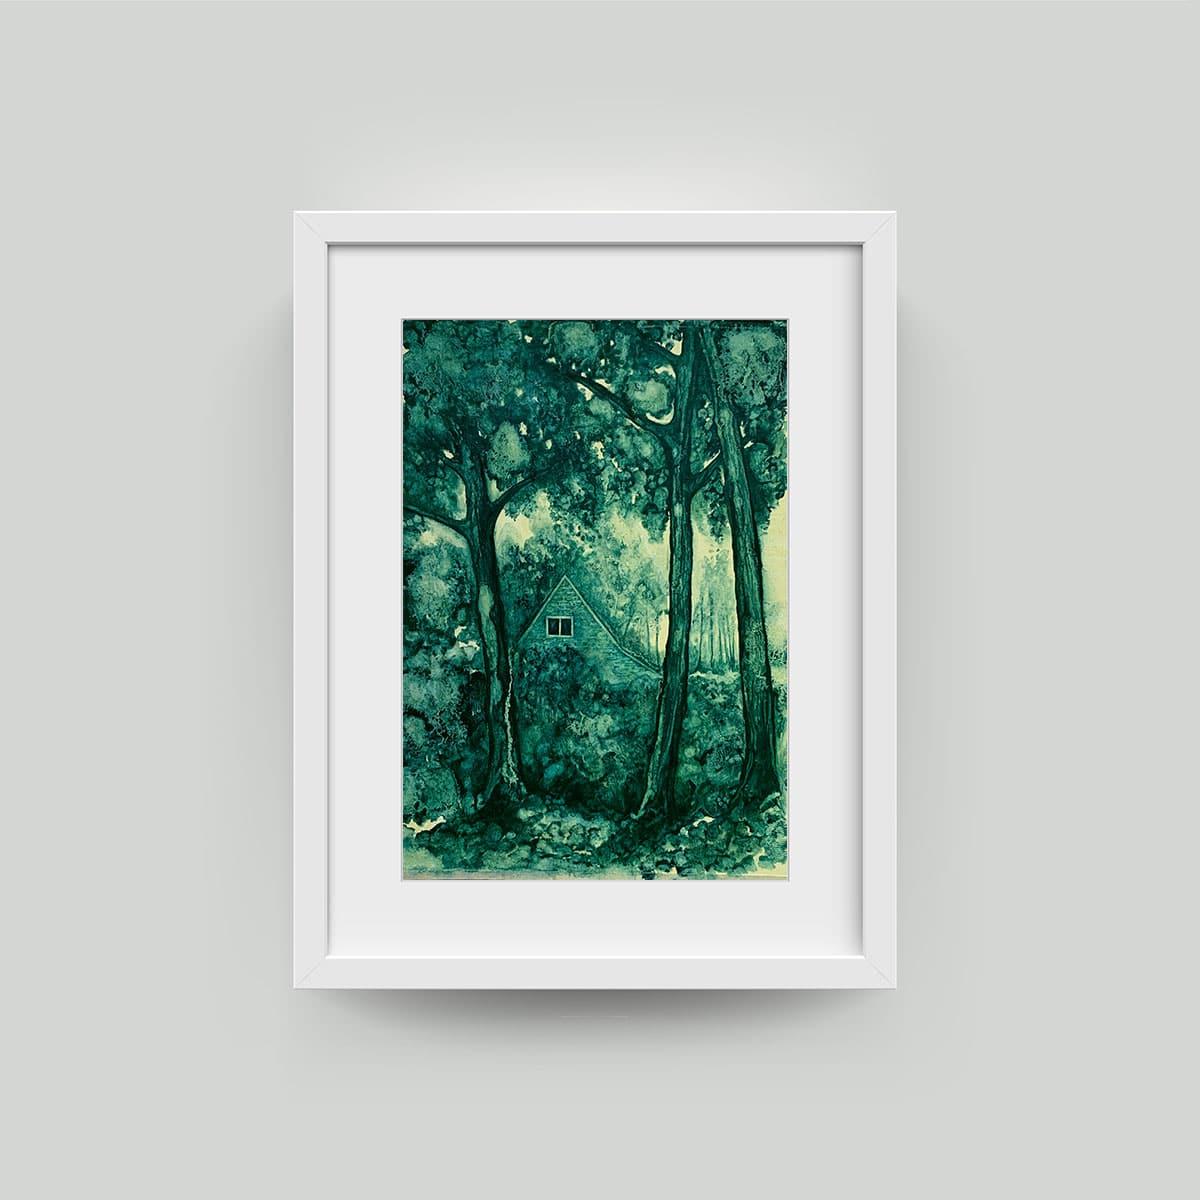 twinkle troughton framed art